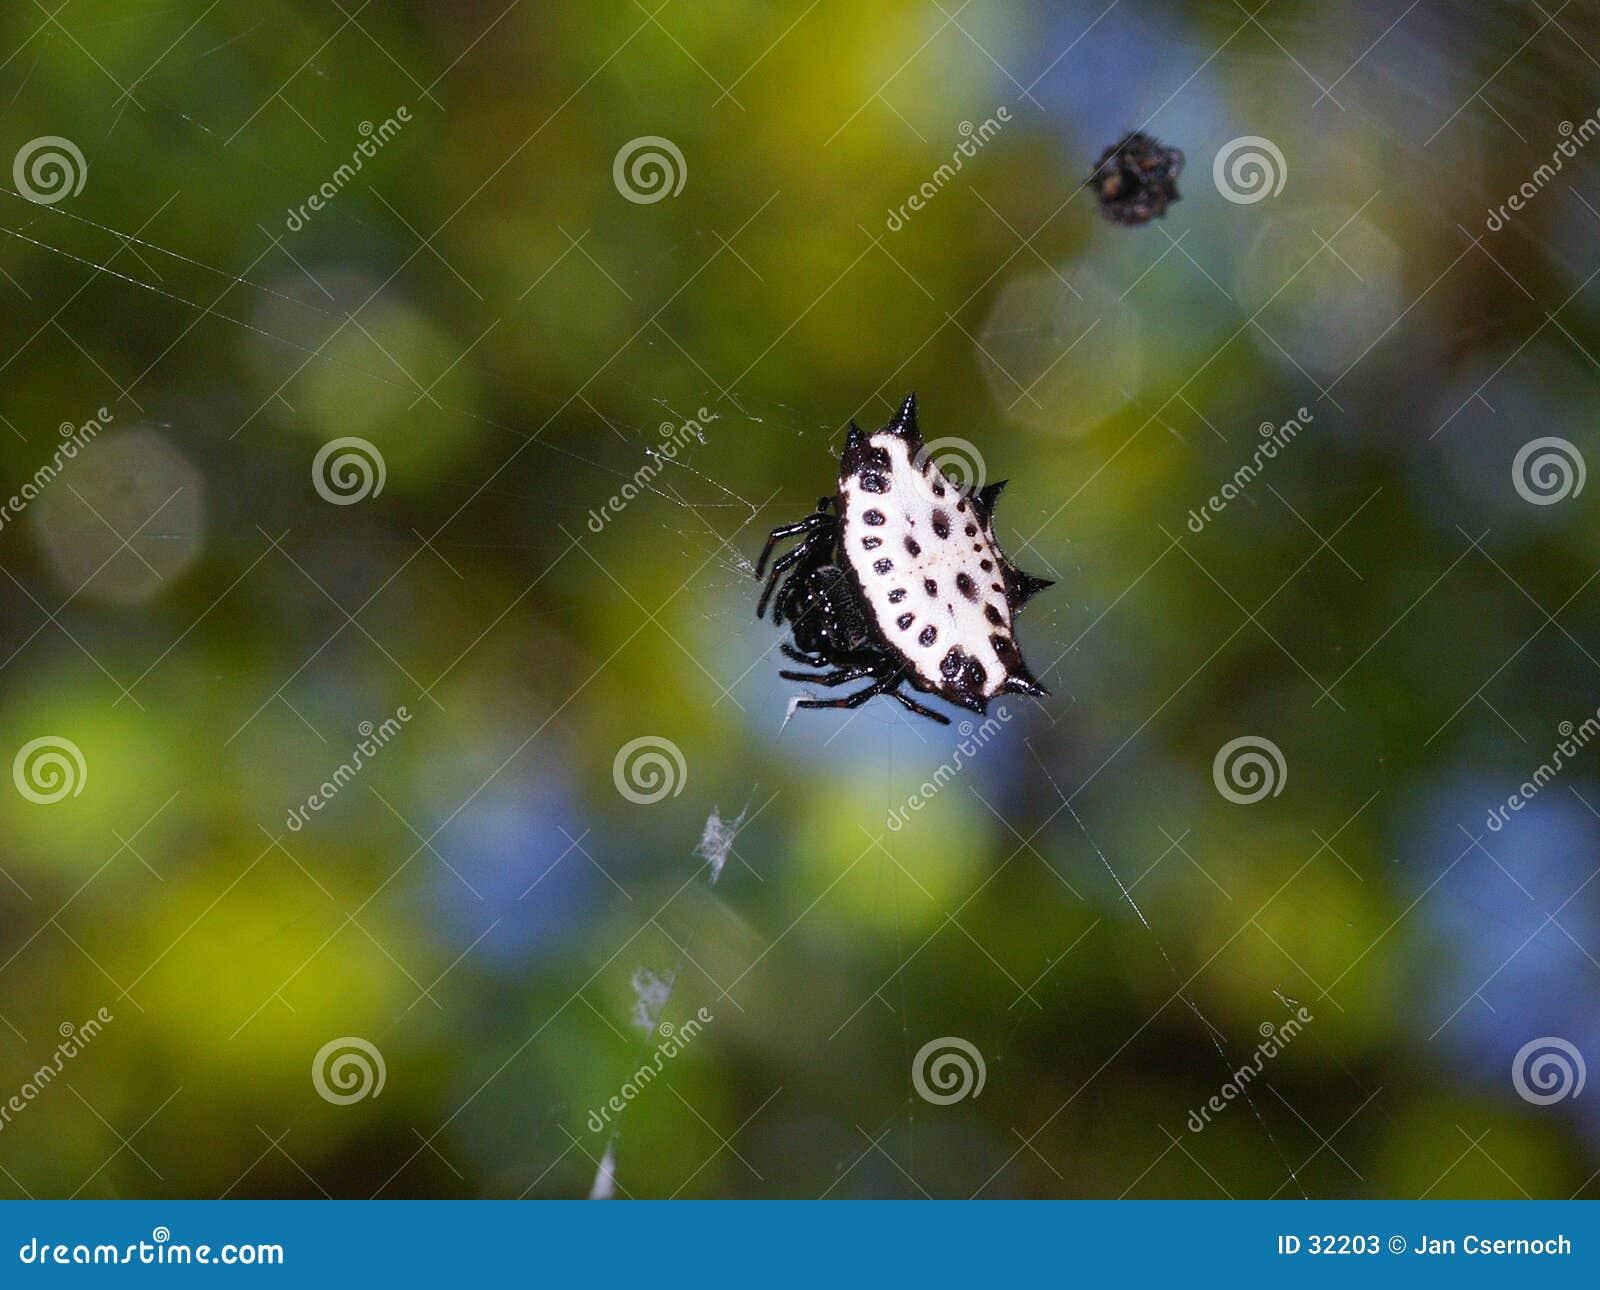 Juweel, Krab of Doornige Spin